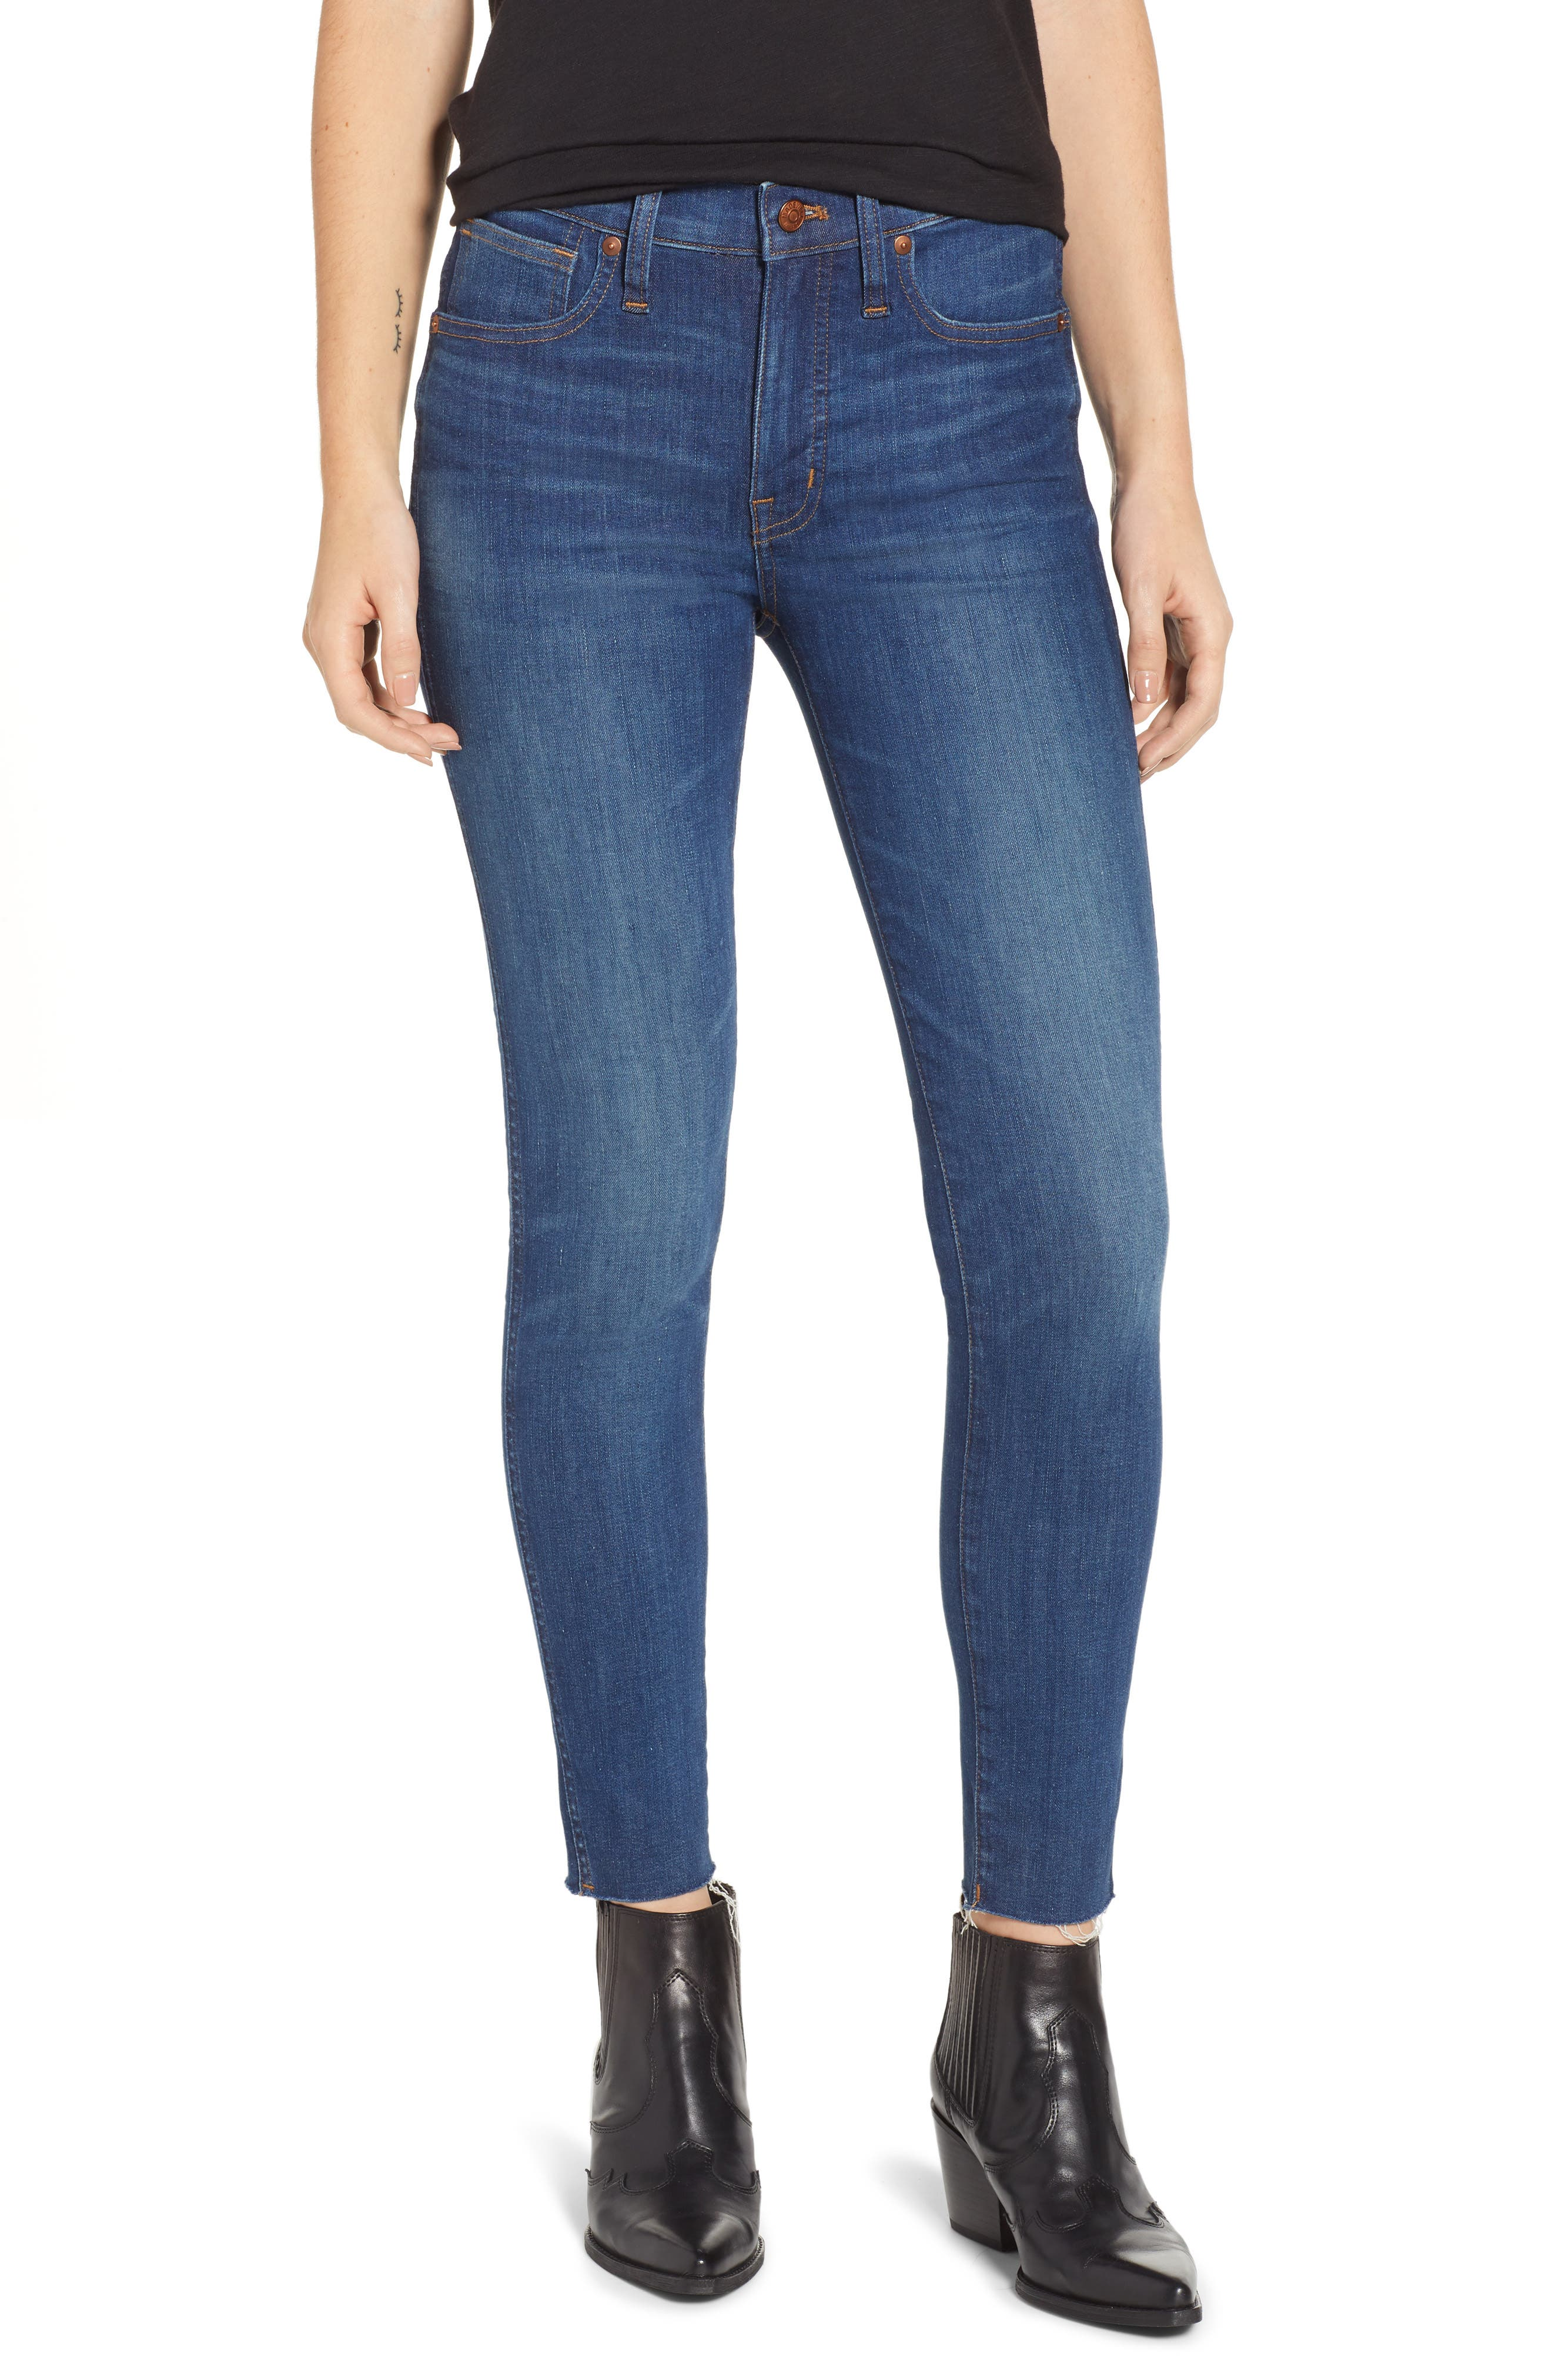 MADEWELL,                             9-Inch Skinny Jeans Raw Hem Edition,                             Main thumbnail 1, color,                             PALOMA